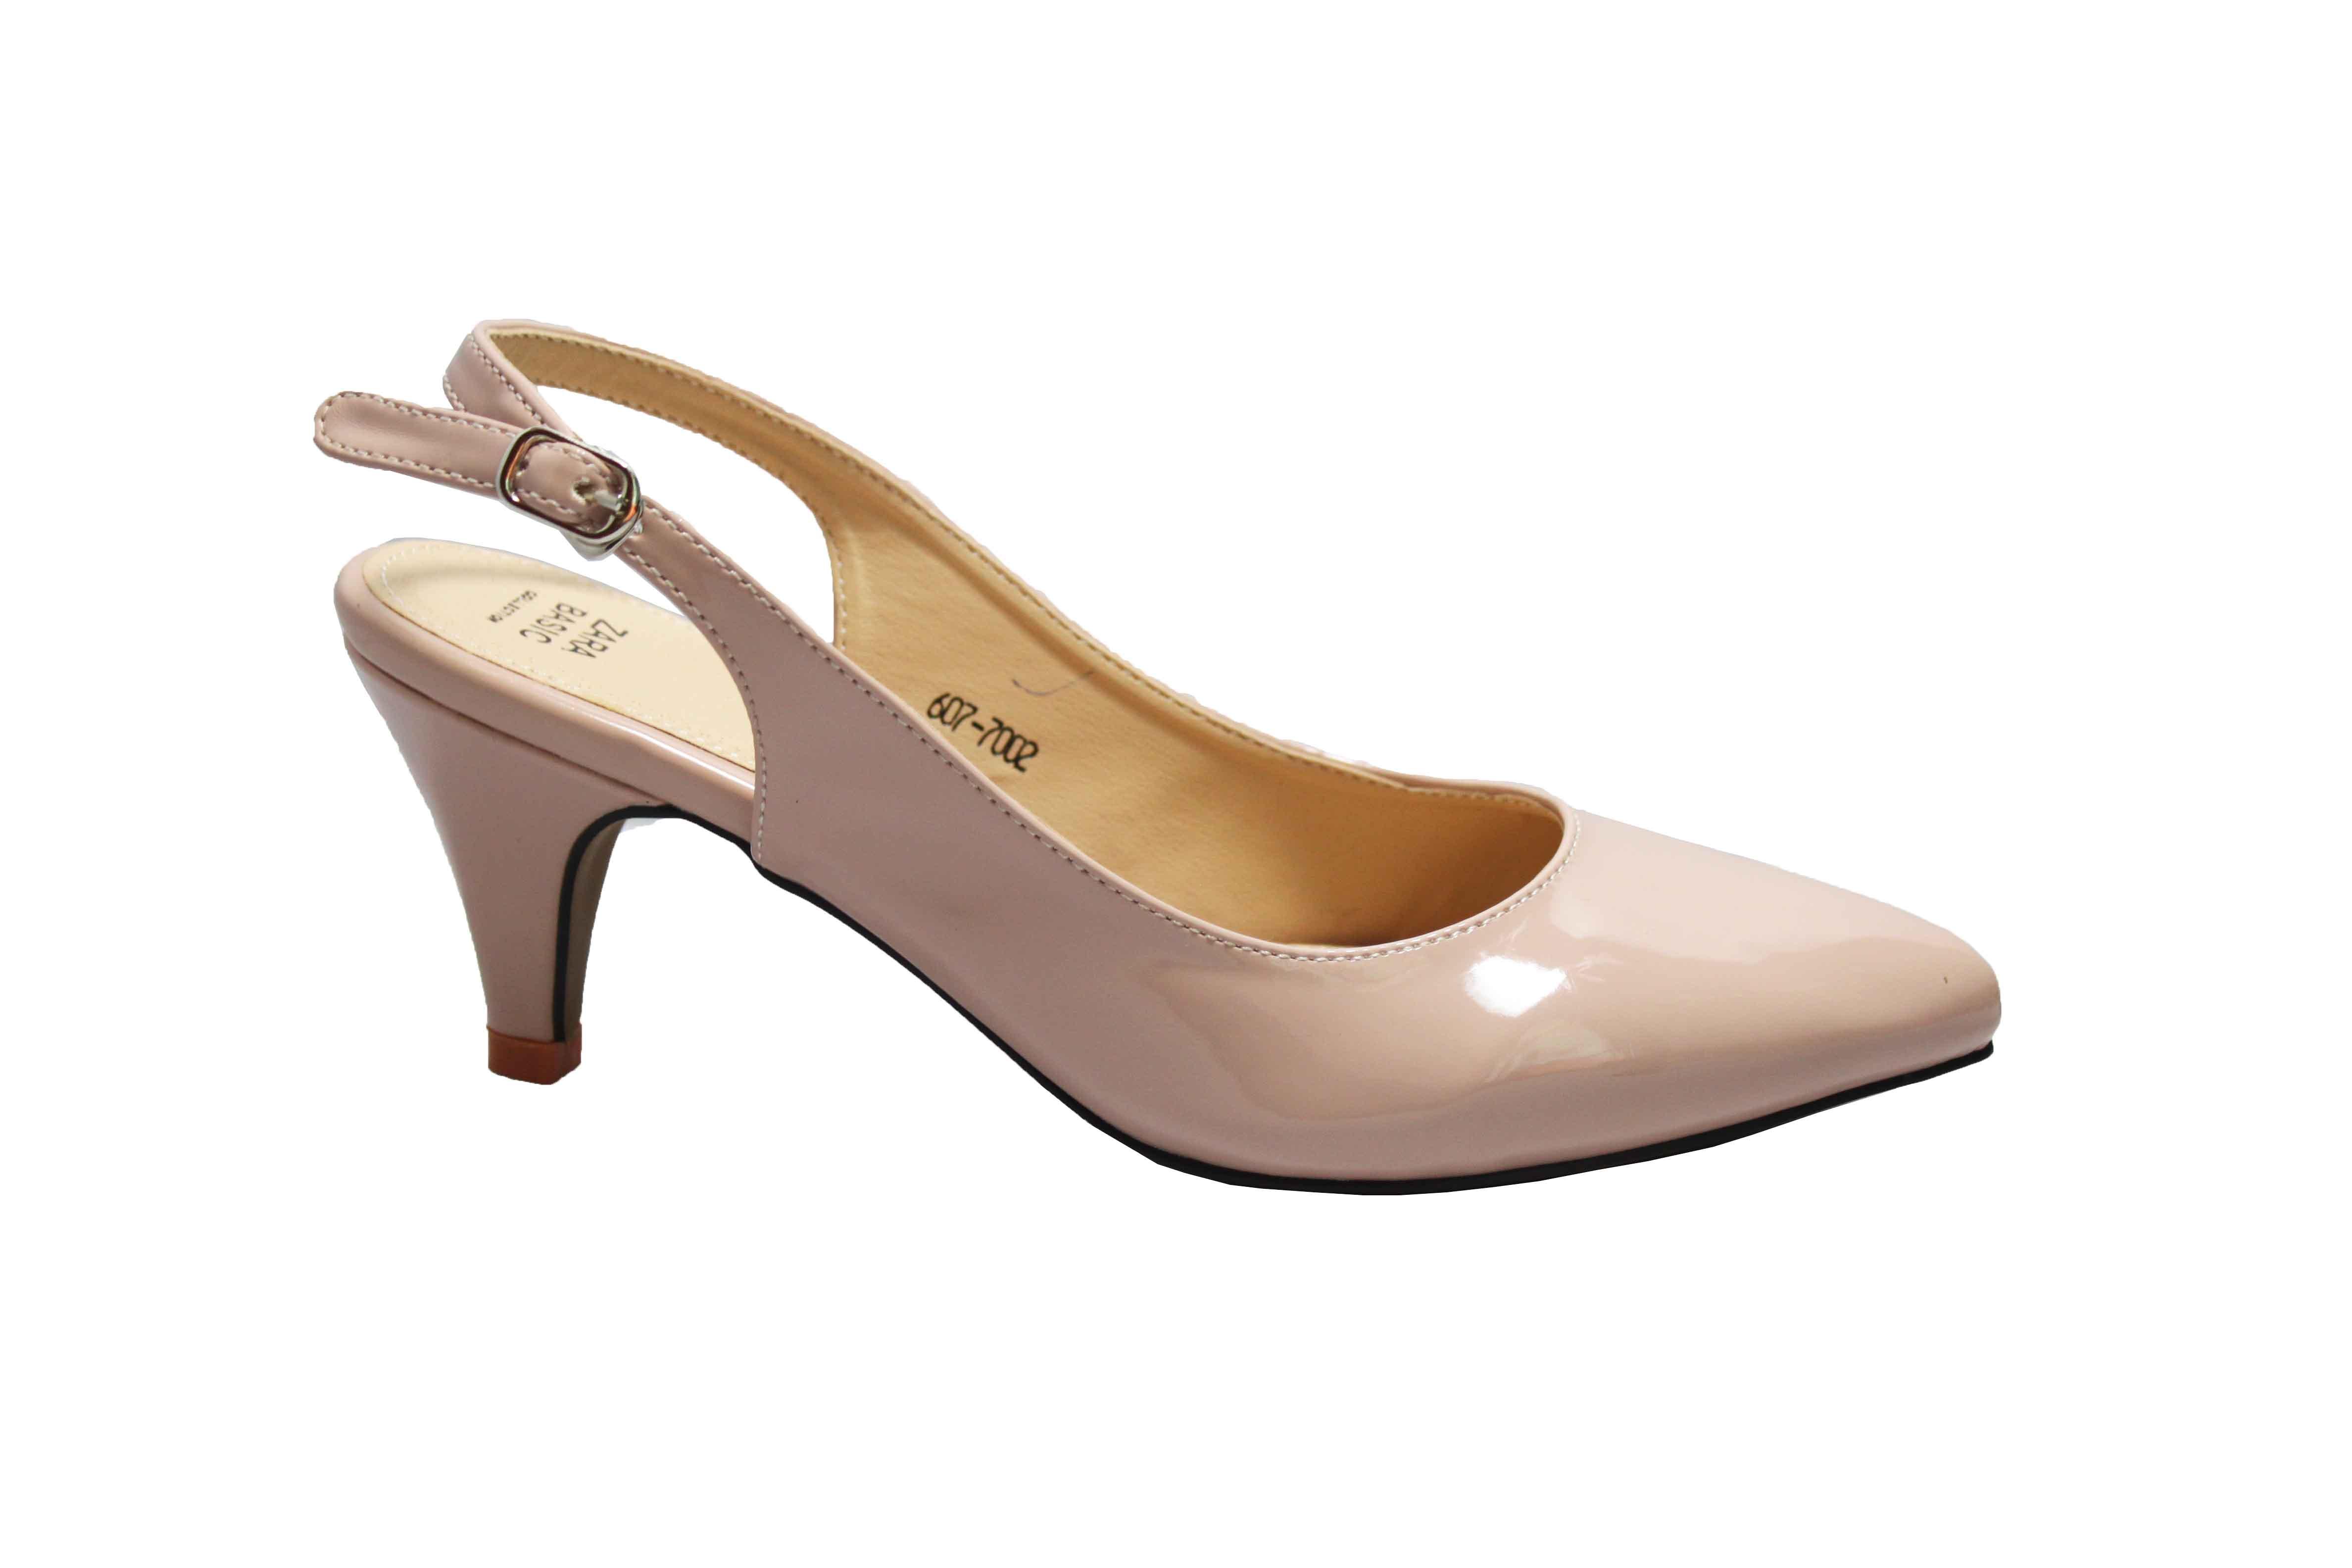 sandal da bóng